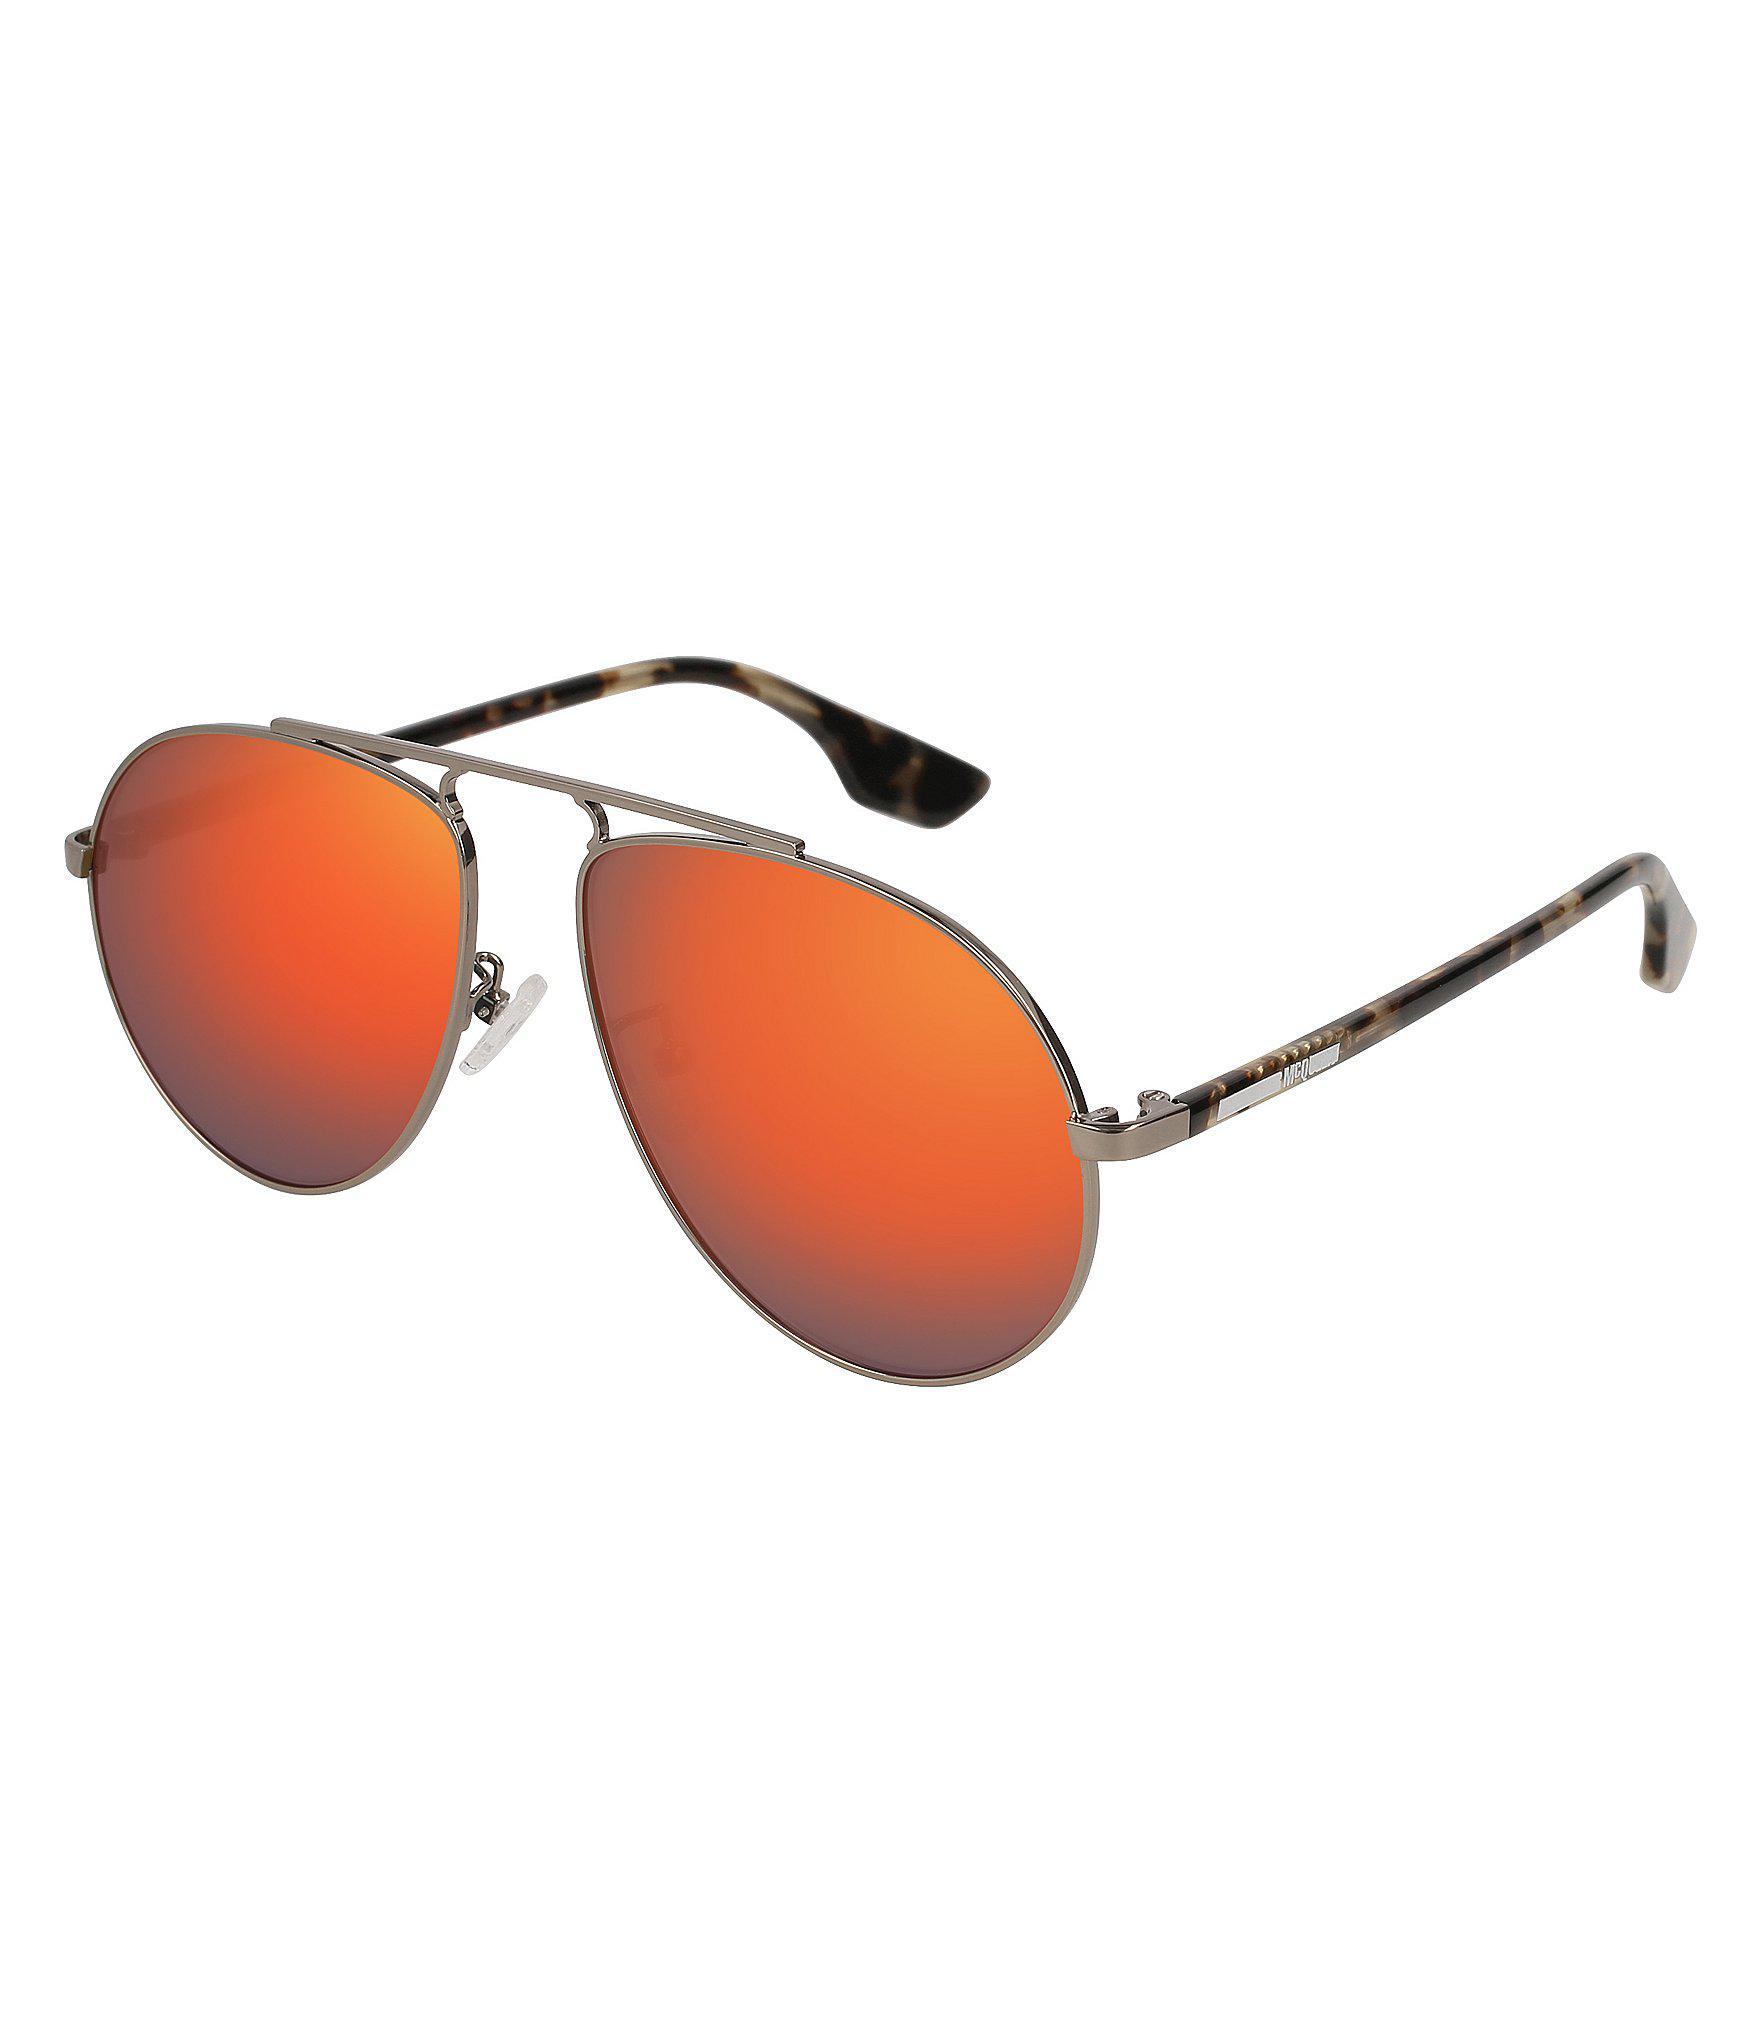 cfda6c67769e Lyst - Alexander McQueen Mcq By Unisex Aviator Sunglasses in Red for Men